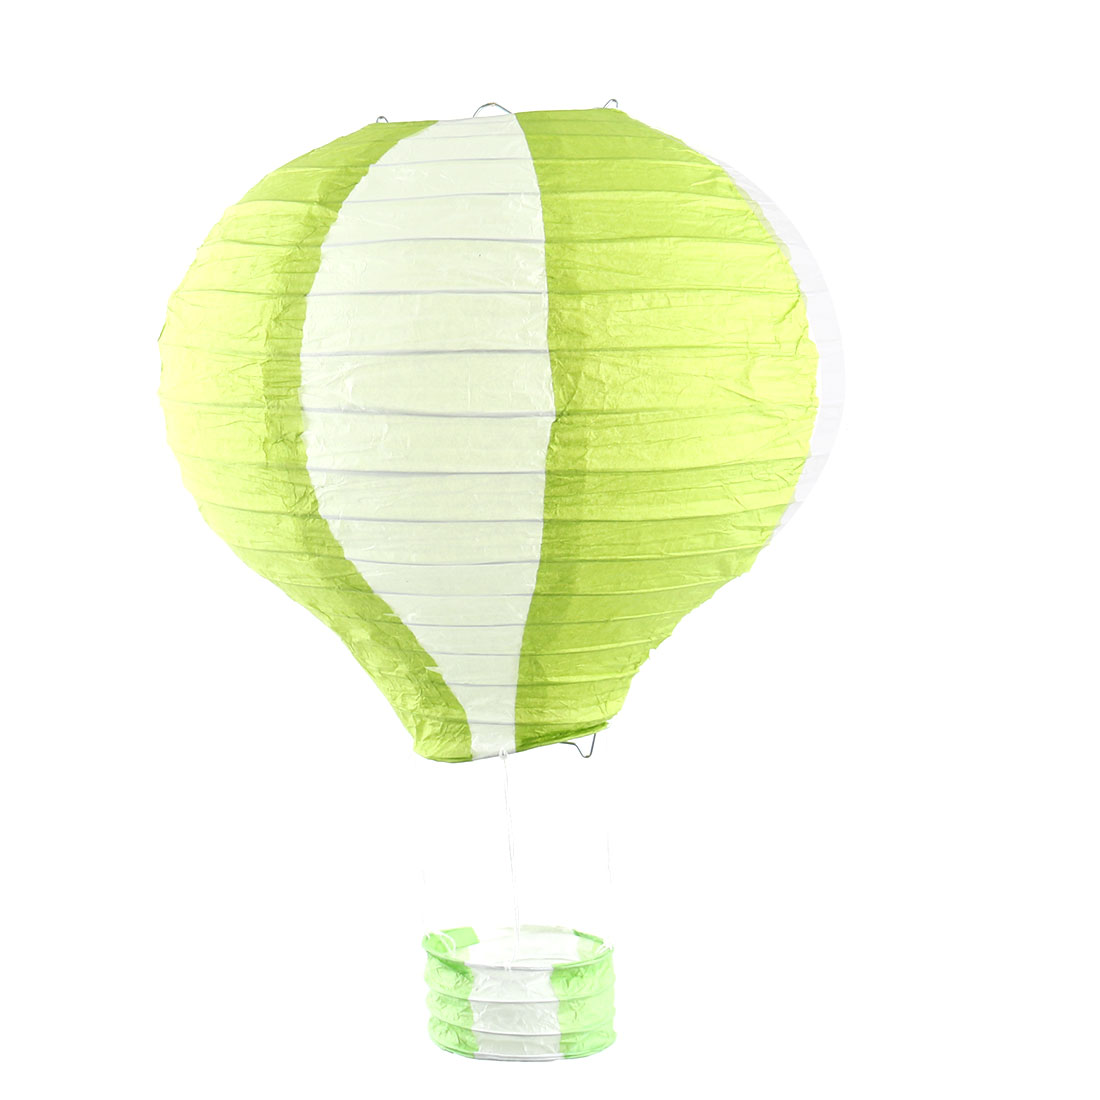 Festival Party Paper DIY Handmade Lightless Hot Air Balloon Lantern Green White - image 6 of 6